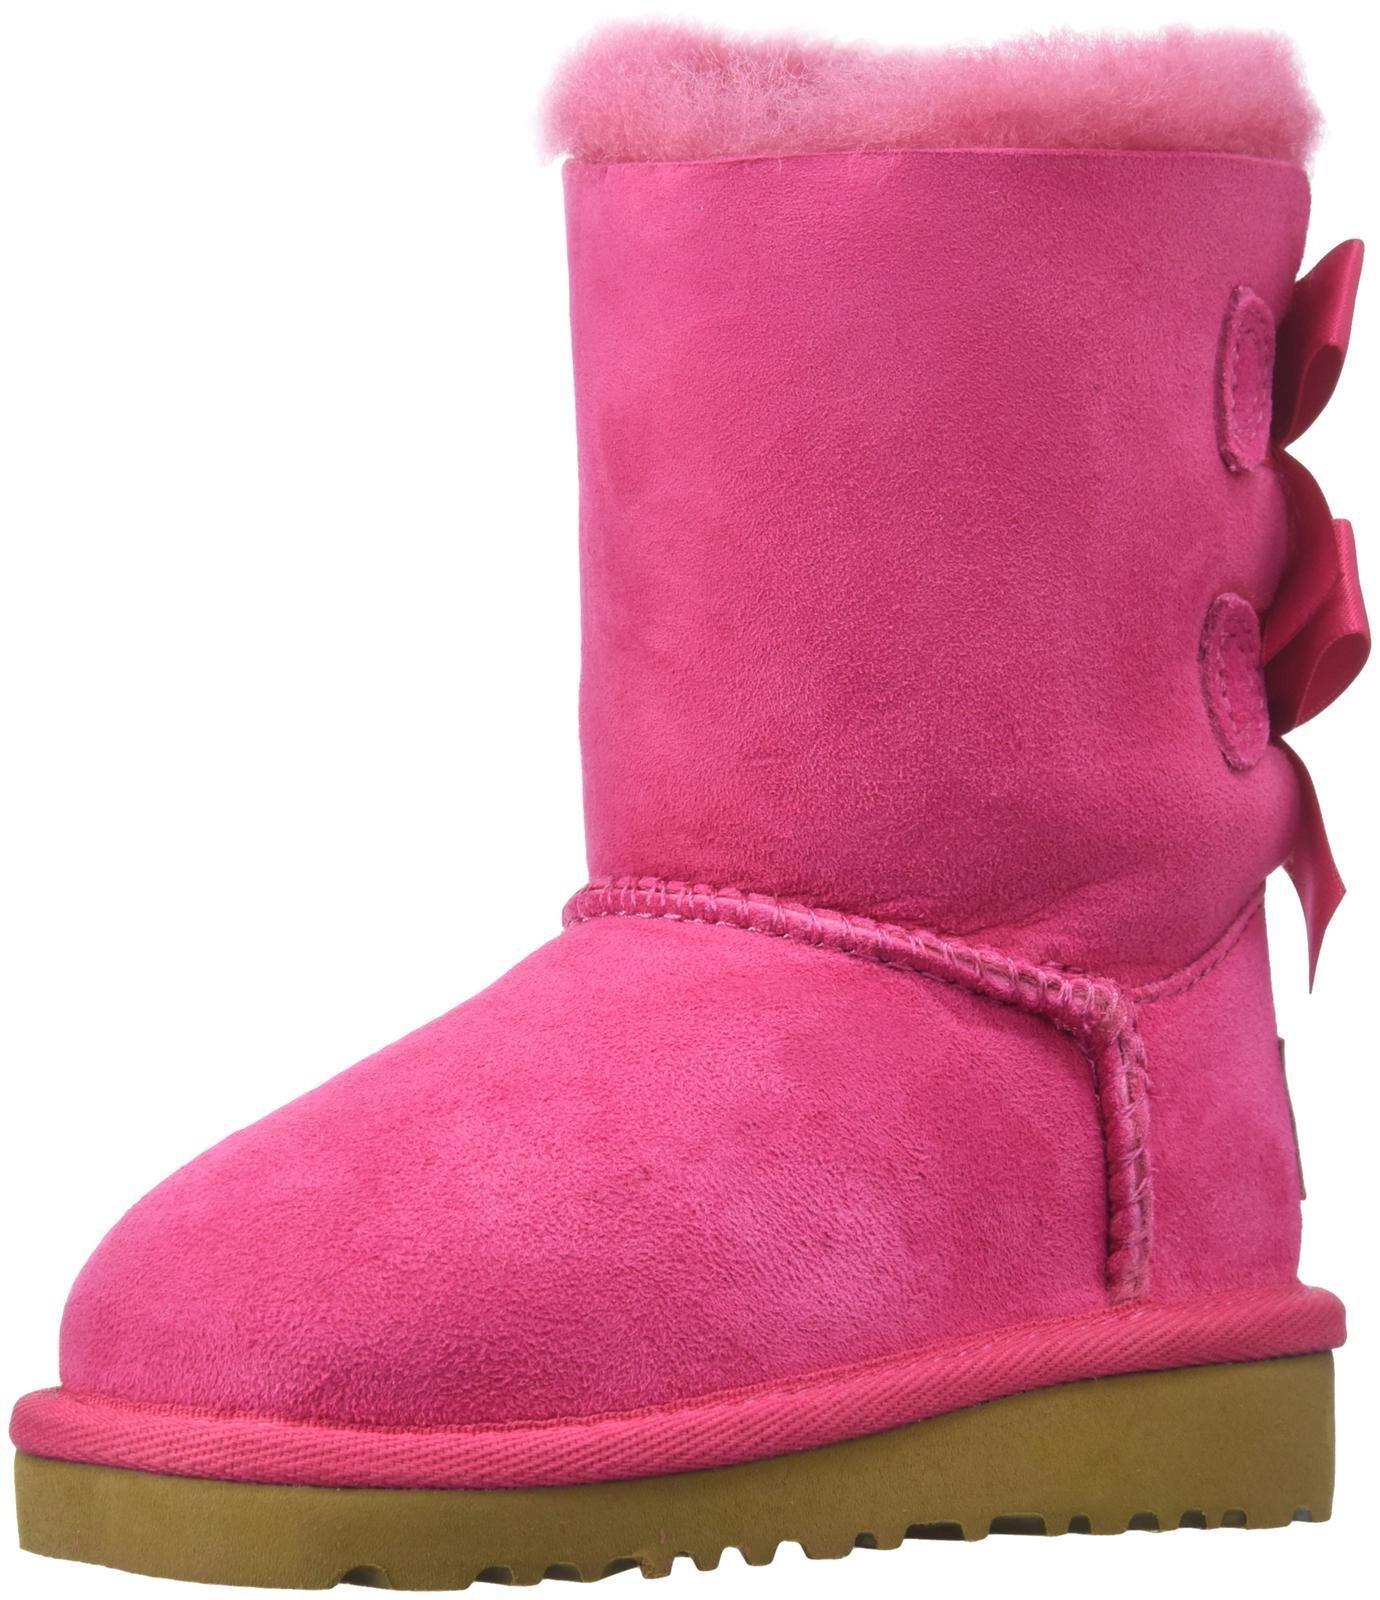 UGG Australia Infants' Bailey Bow Toddler Suede Boots,Cerise,8 Toddler US